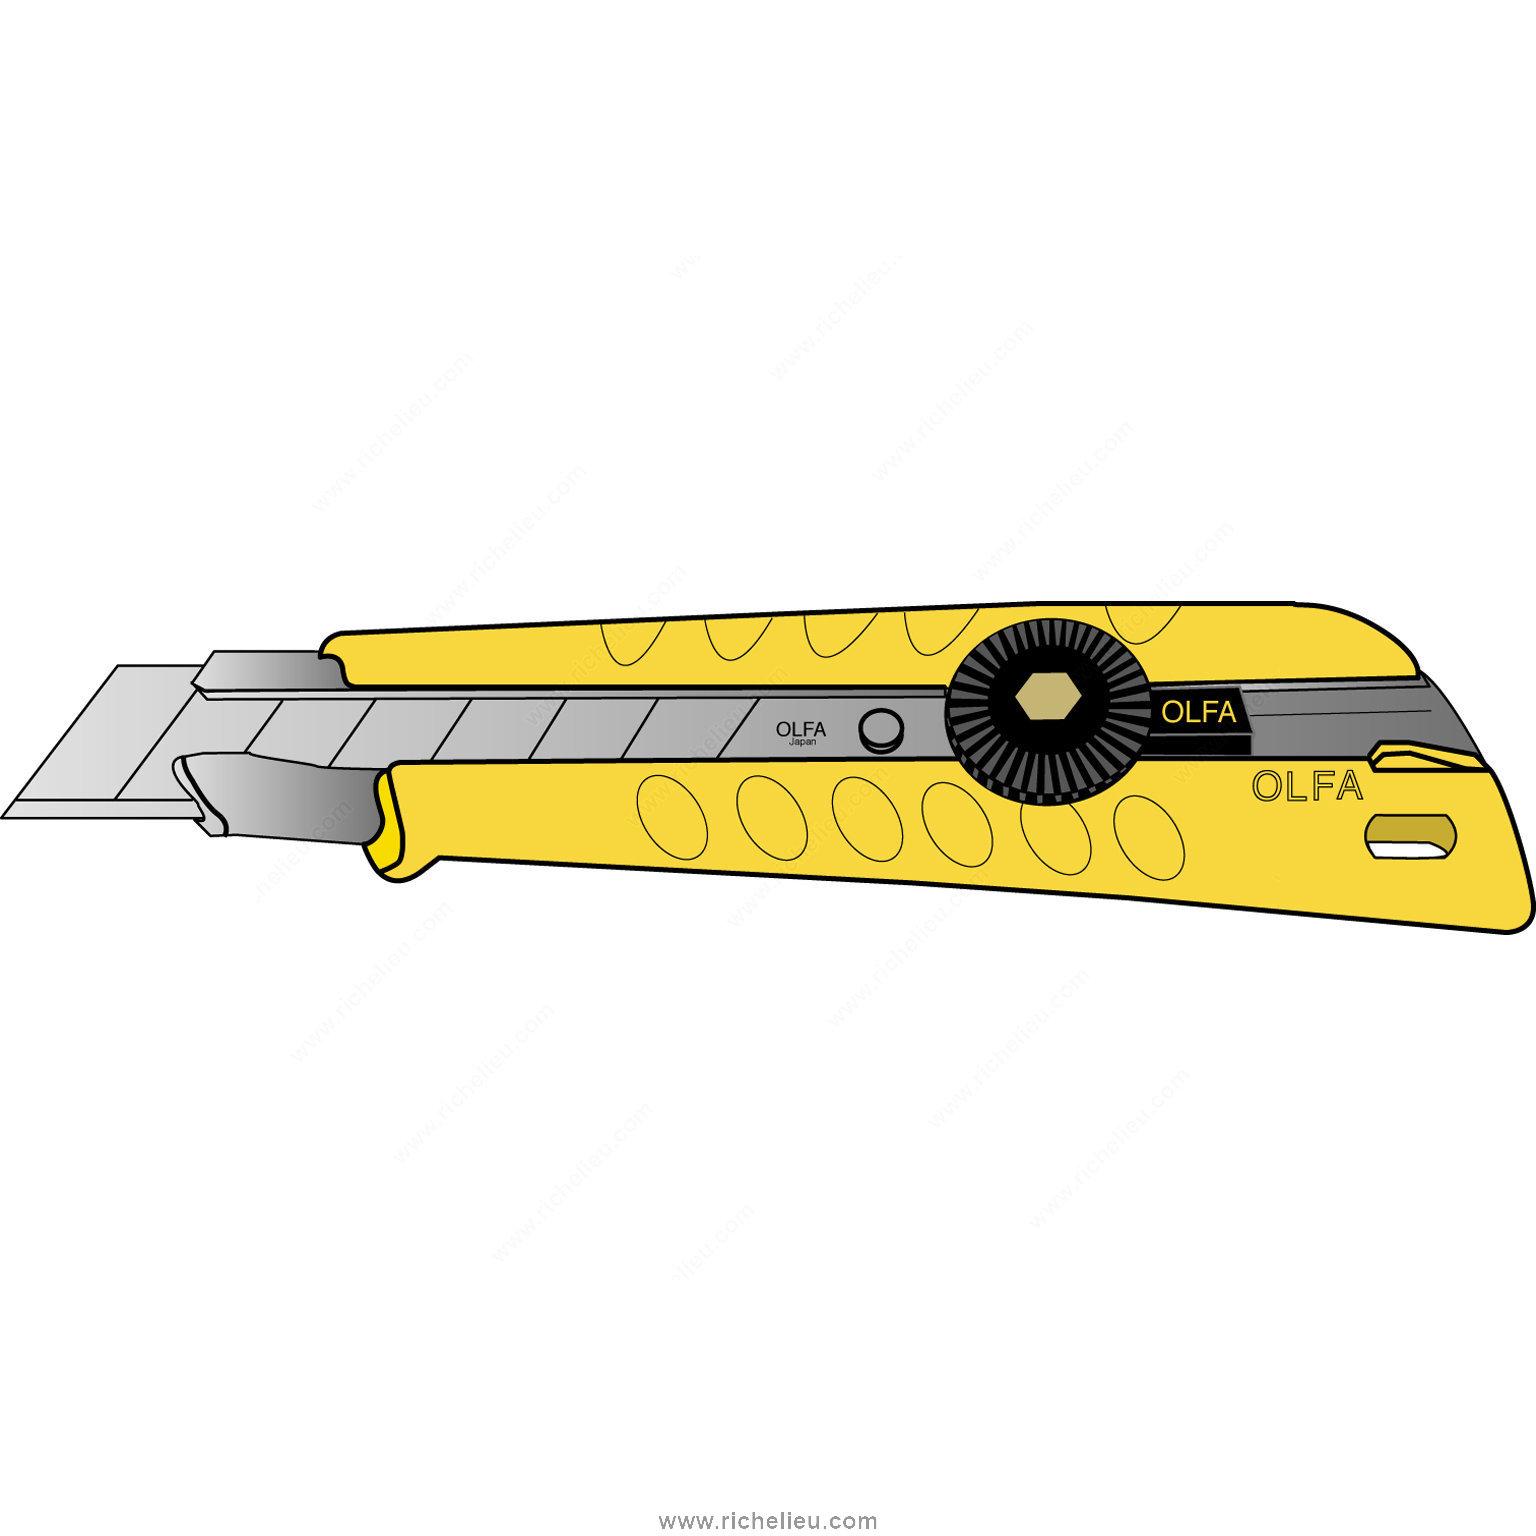 Heavy Duty Olfa Cutters And Blades 18 Mm Richelieu